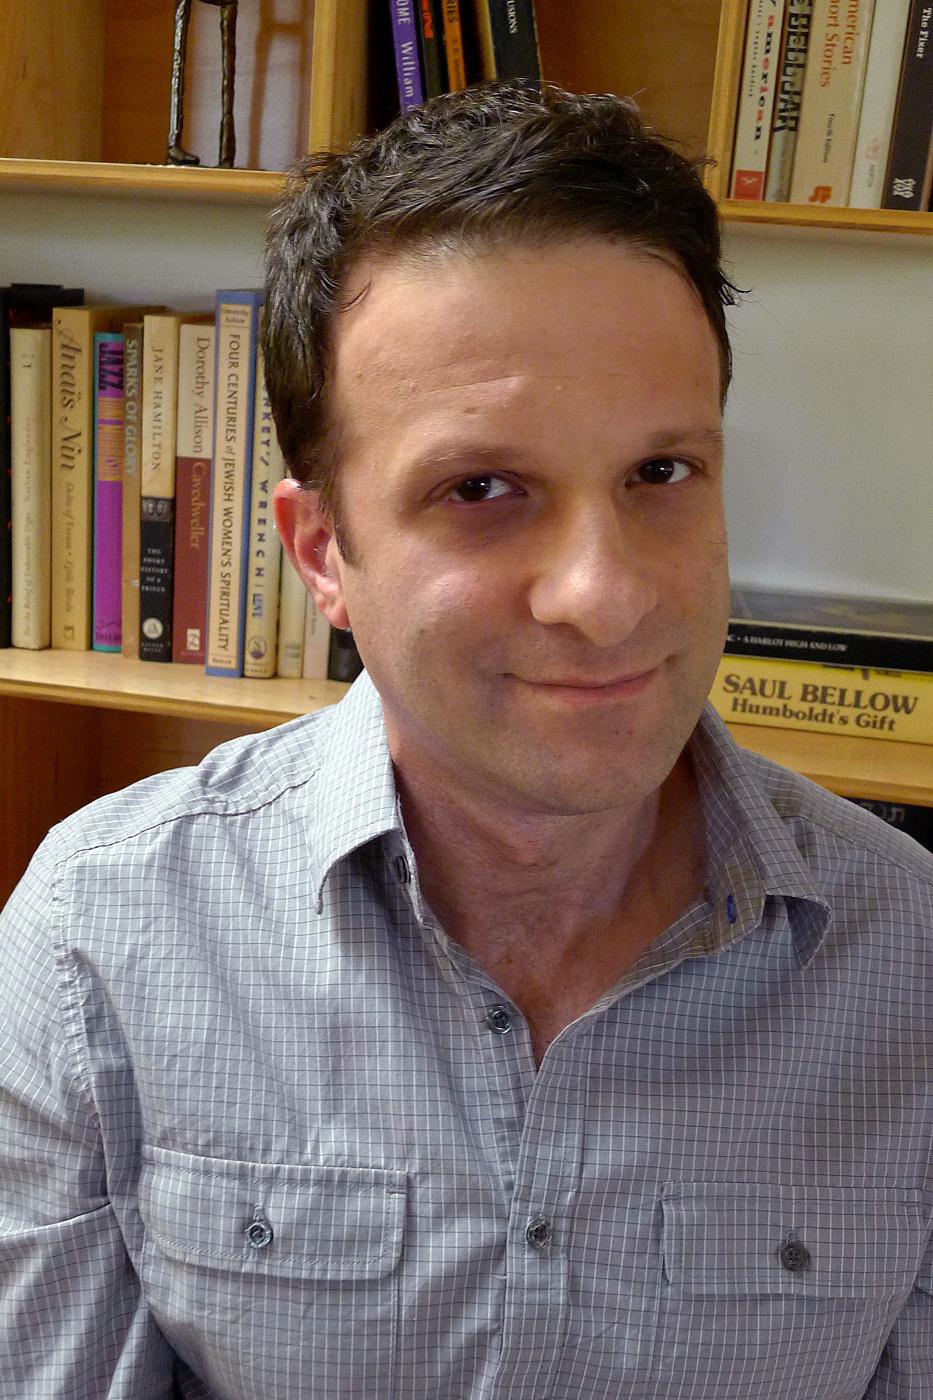 David Gissen, image credit Rachel Schreiber, courtesy of CCA.